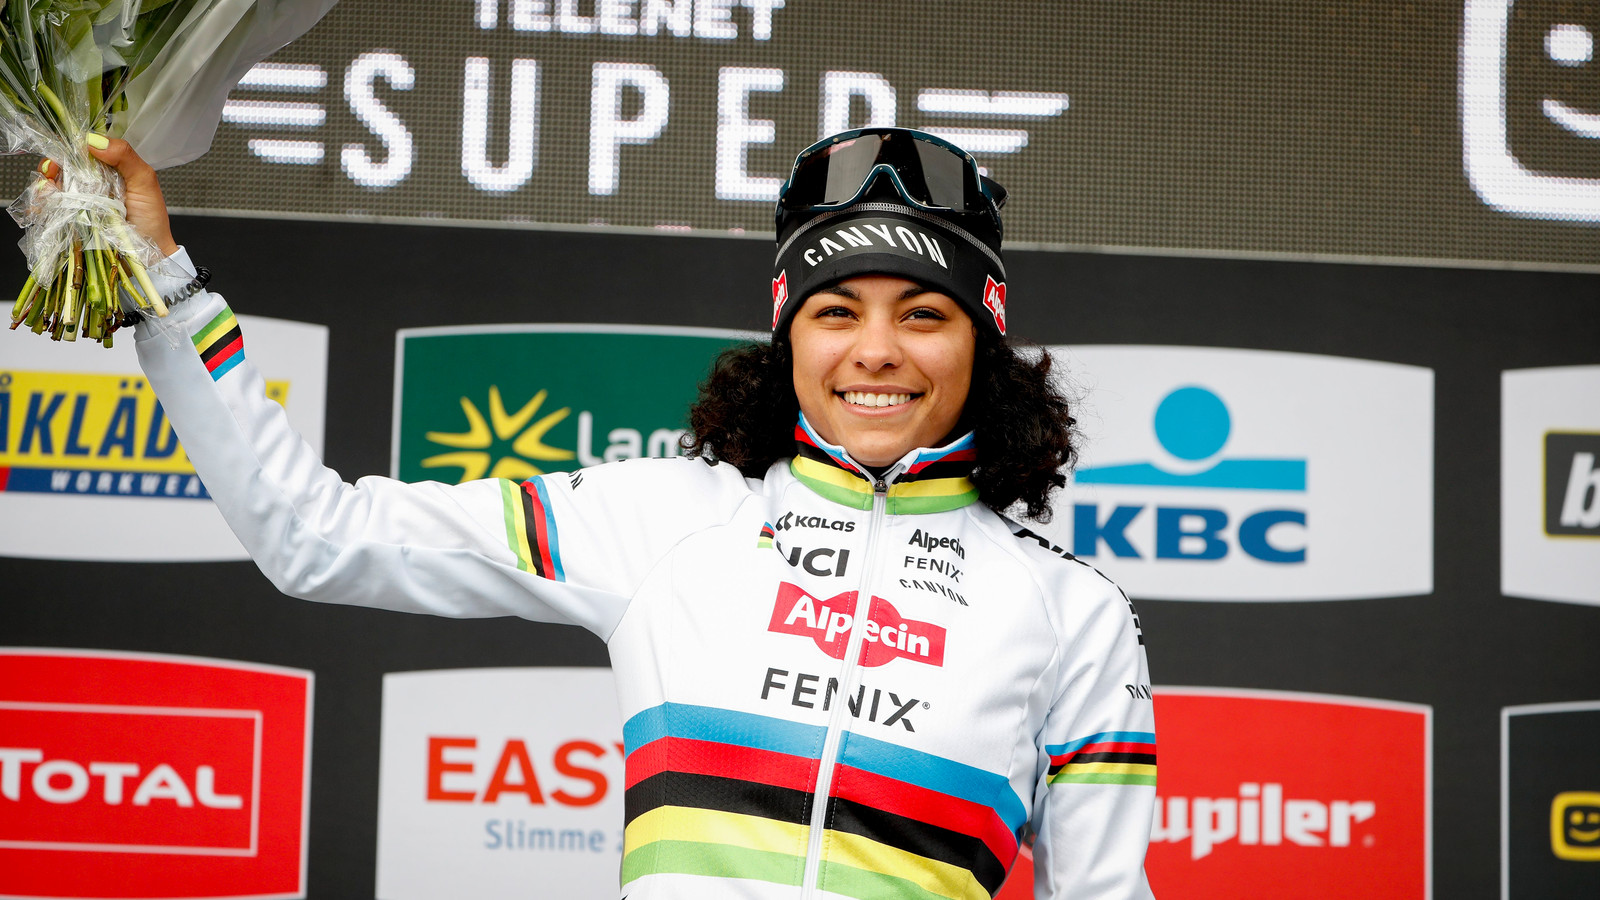 Krijgt wereldkampioene Ceylin Alvarado een plekje in jouw Gouden Cross-ploeg?